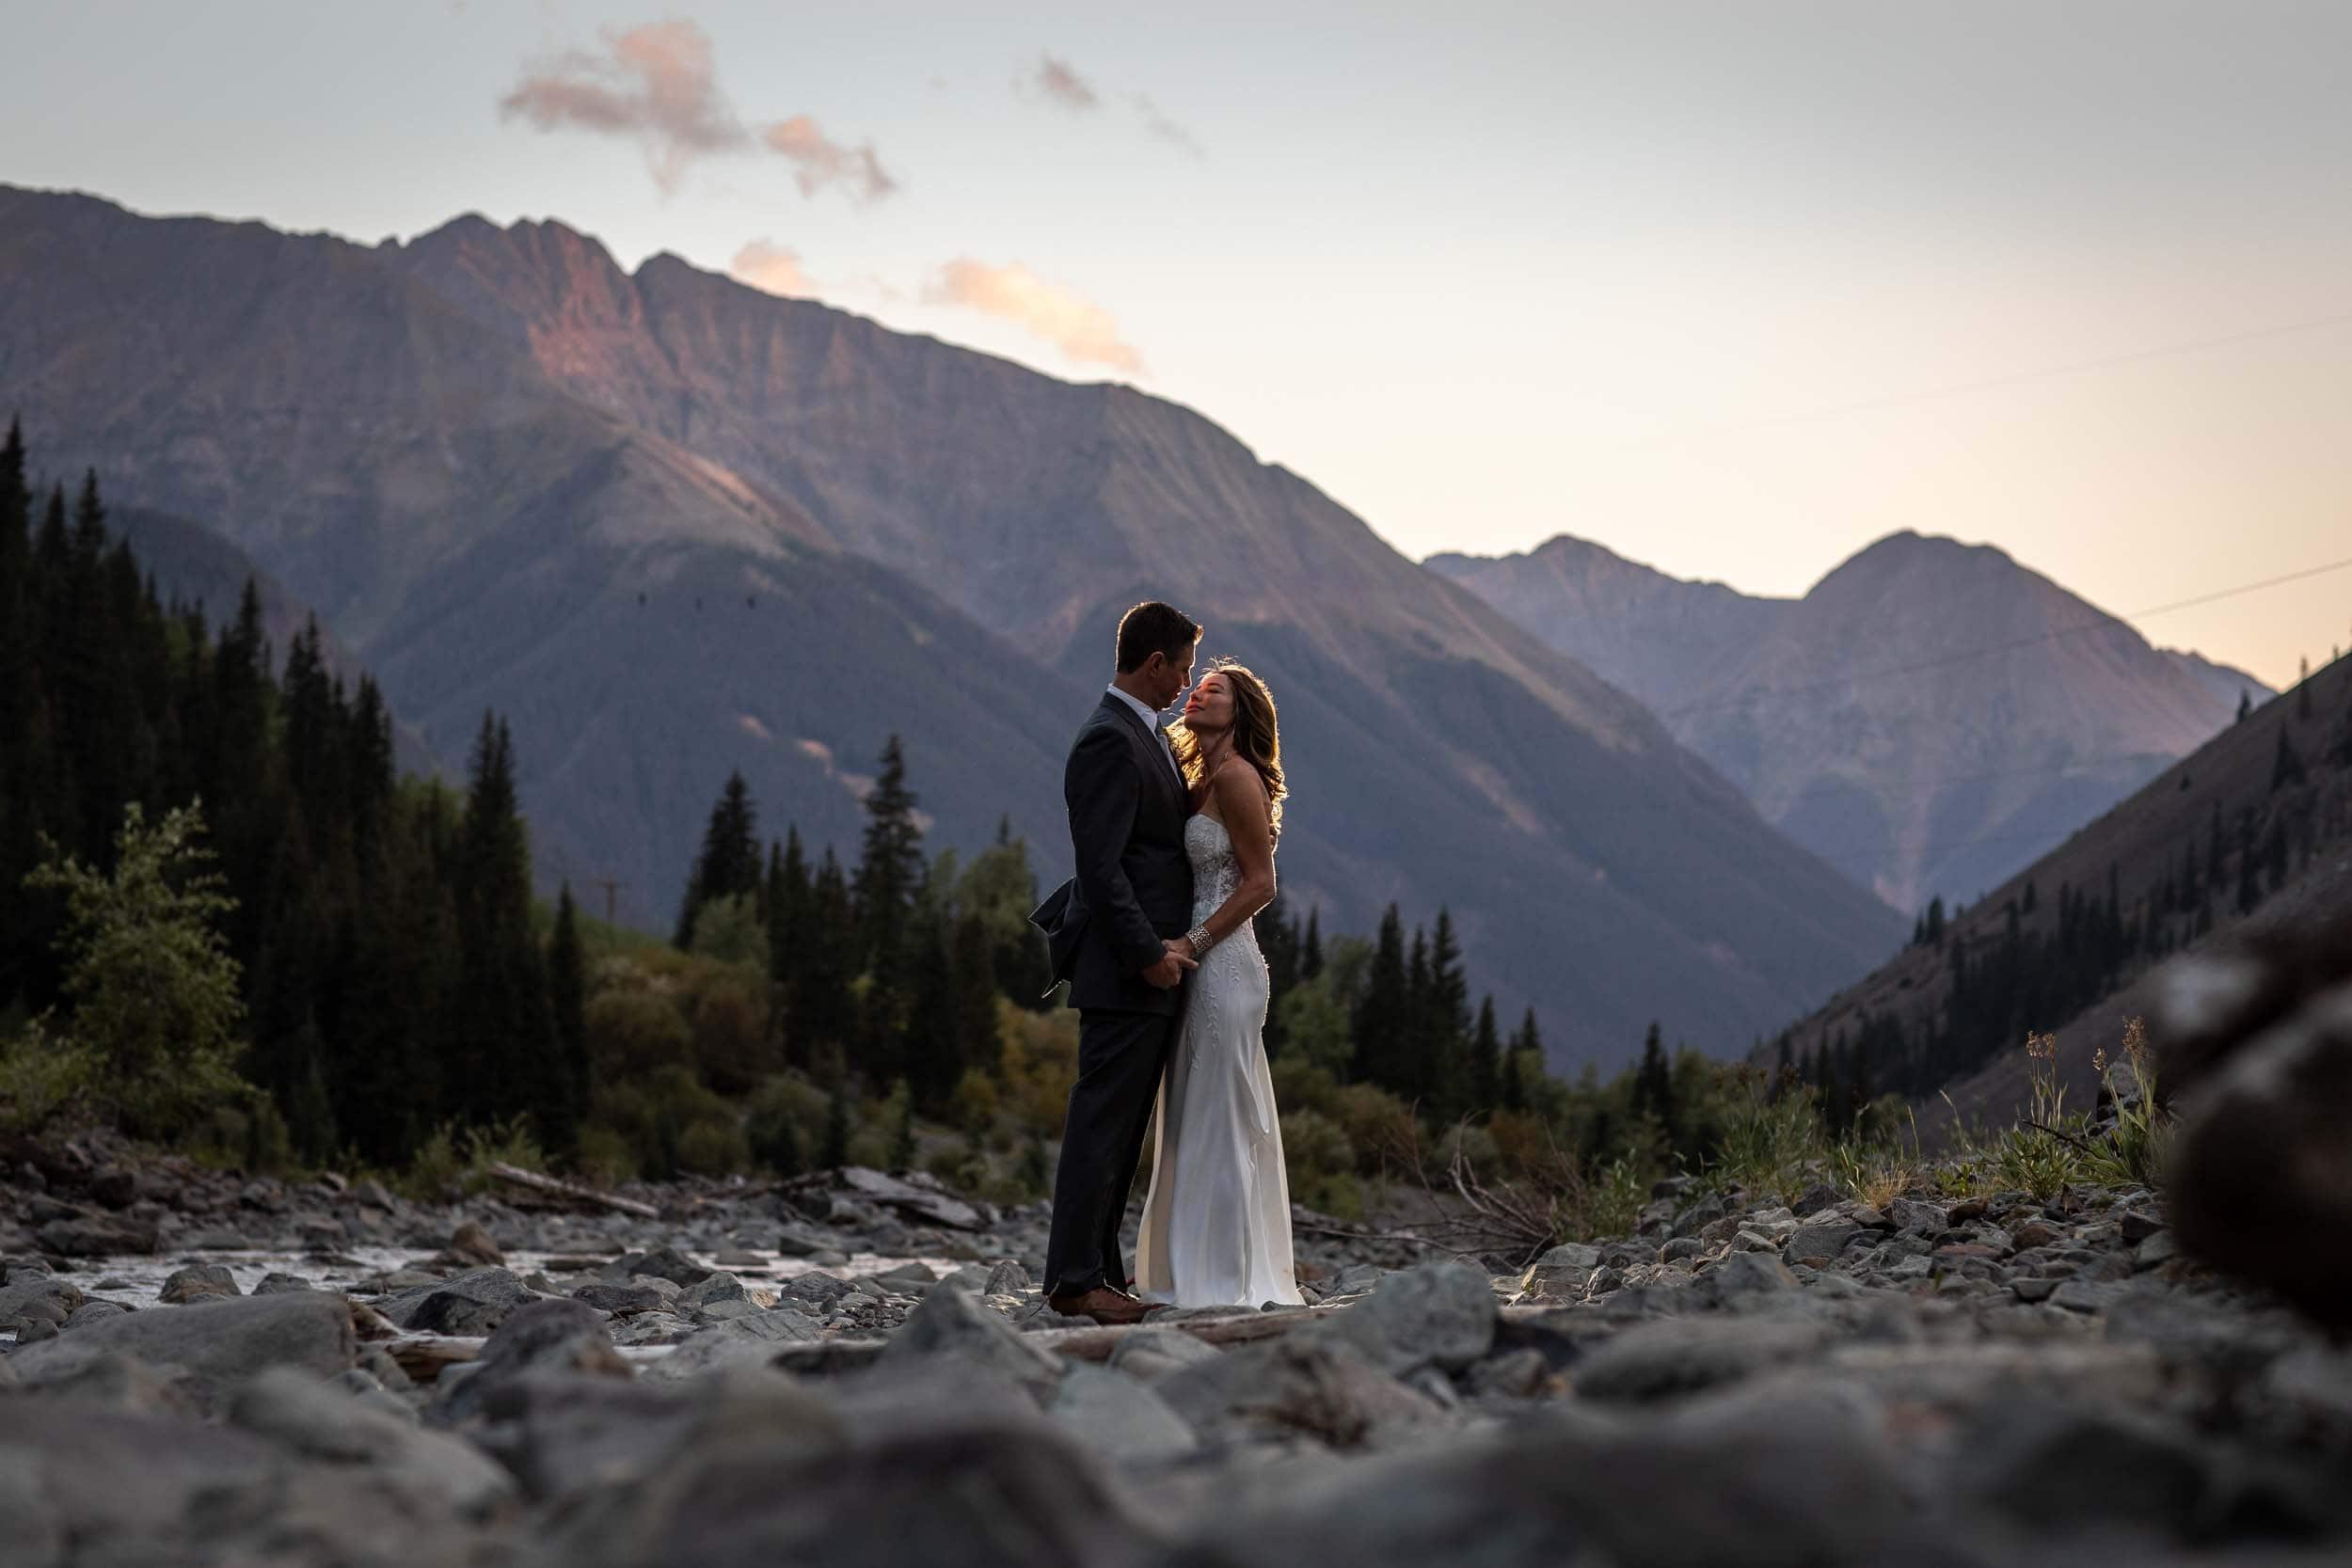 sunset portrait of the newlyweds